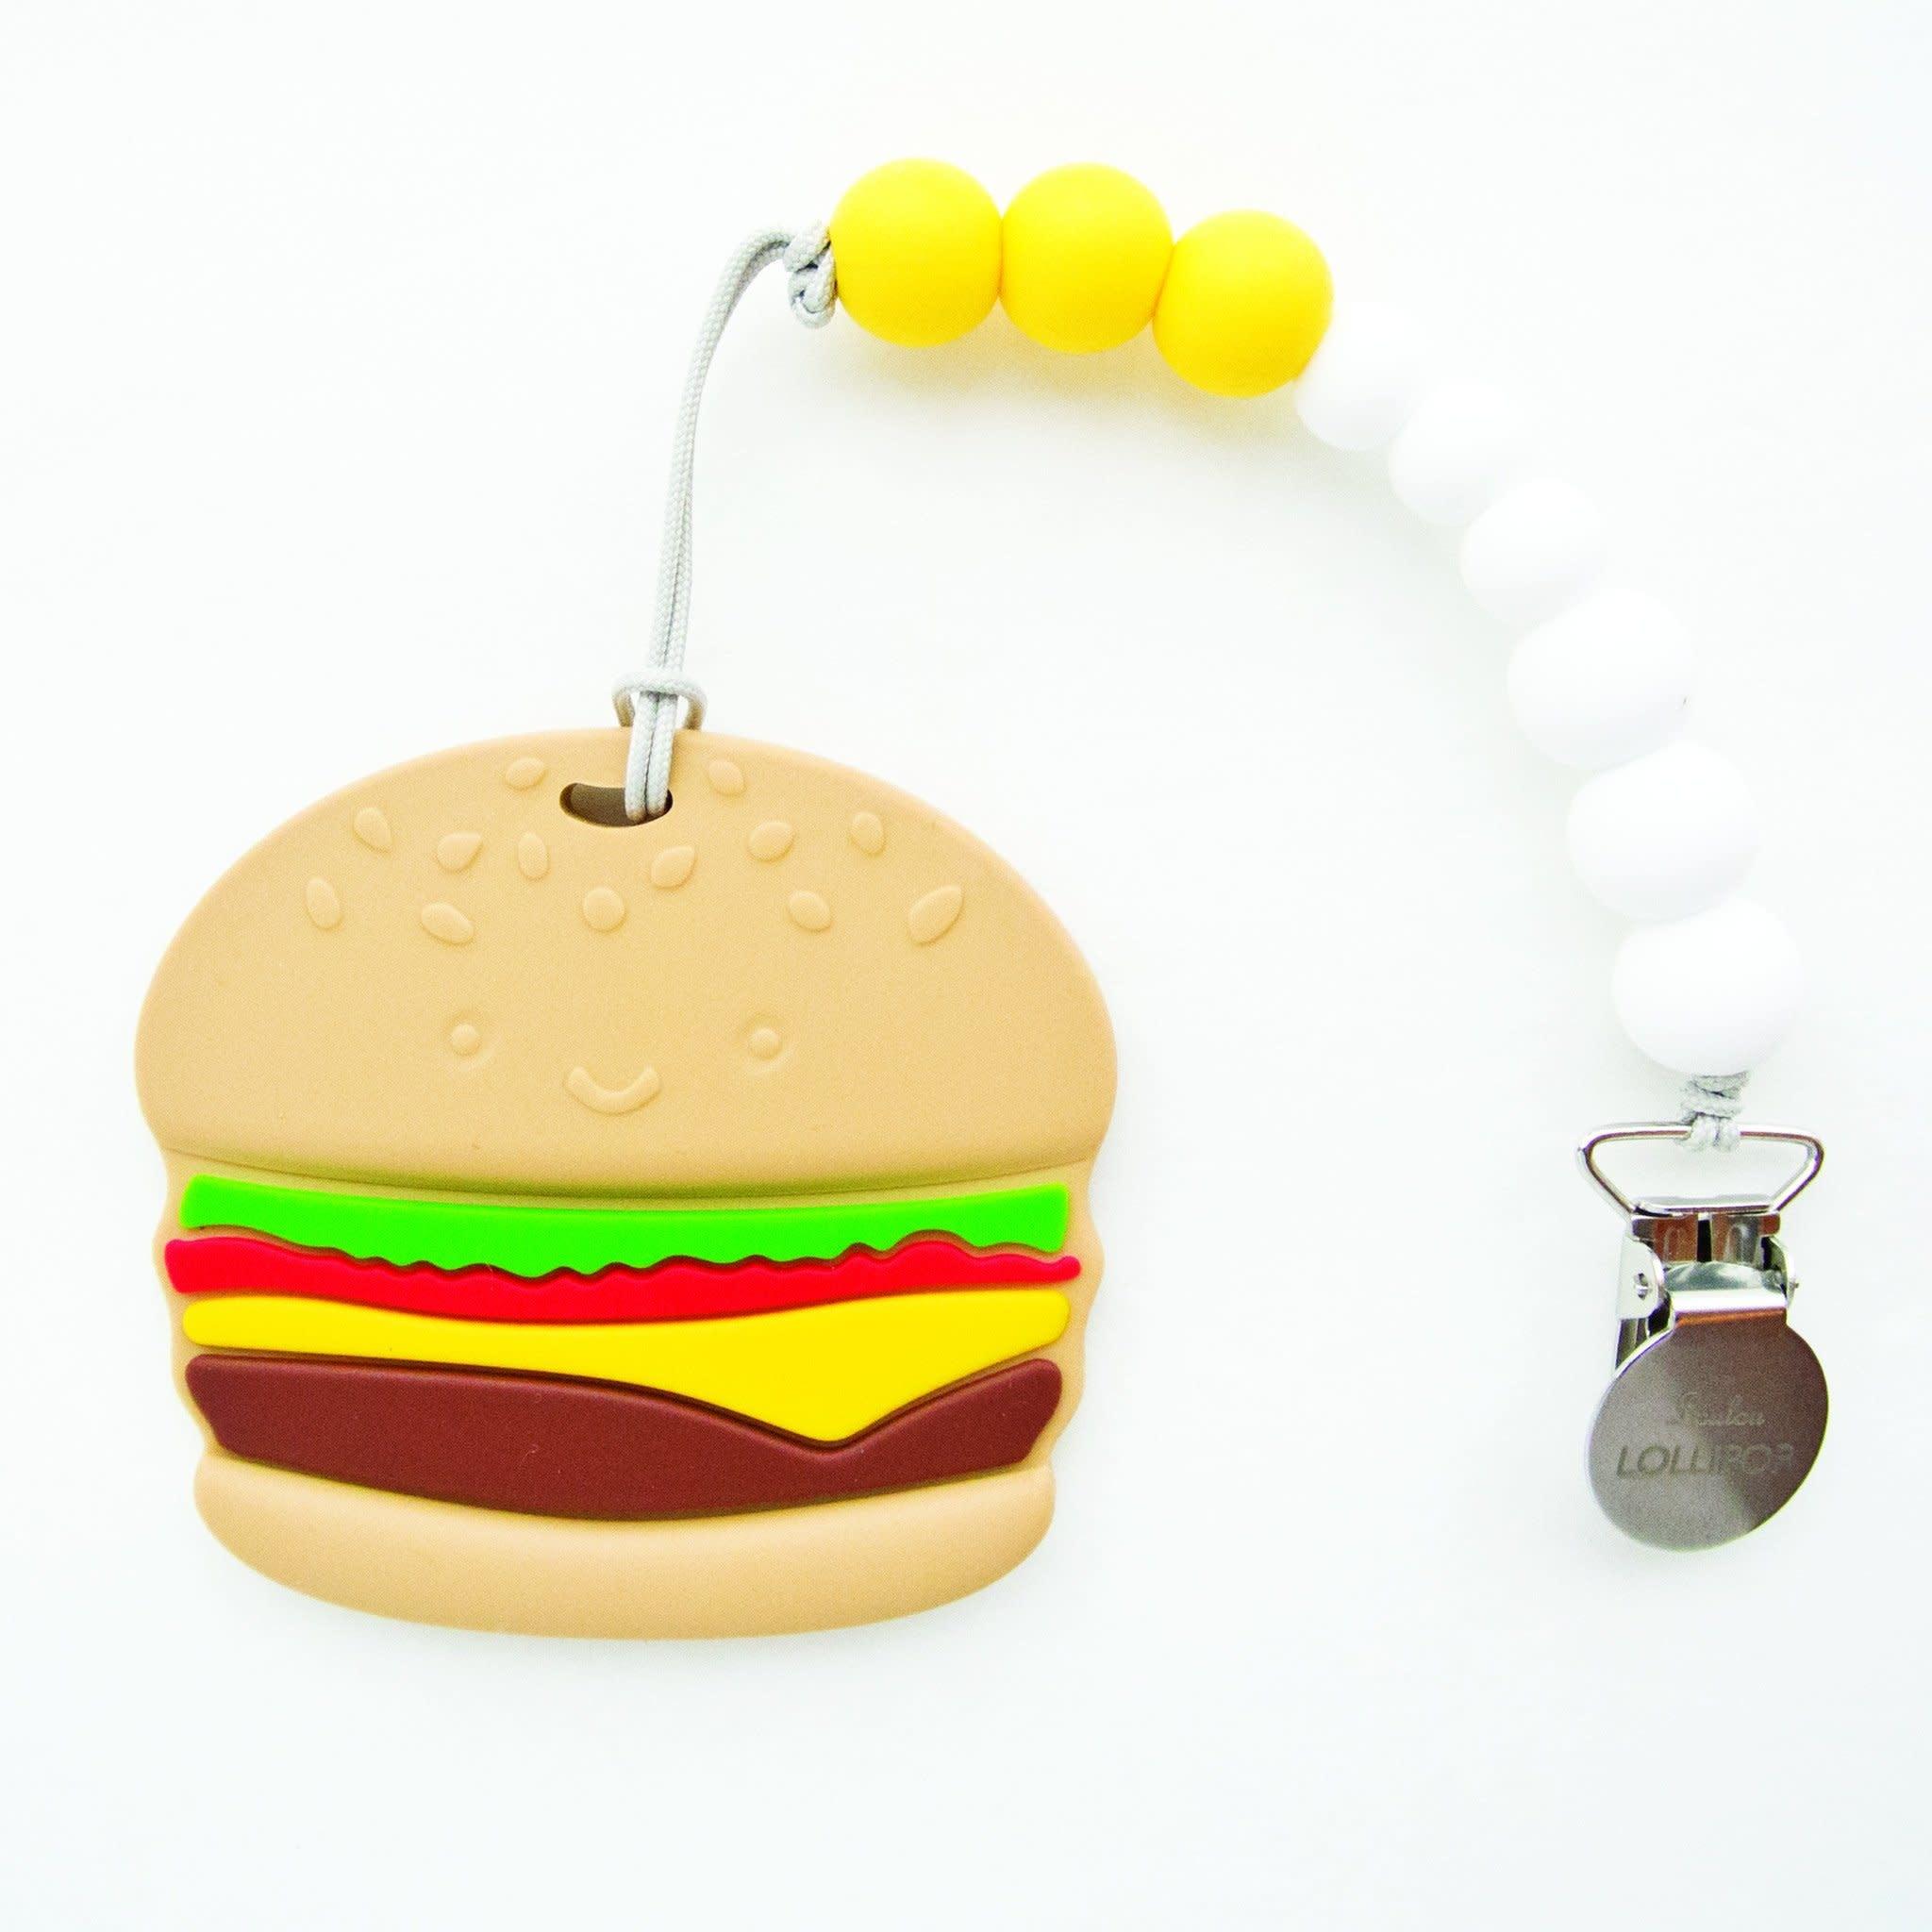 Lou Lou Lollipop Silicone Teether Set - Burger